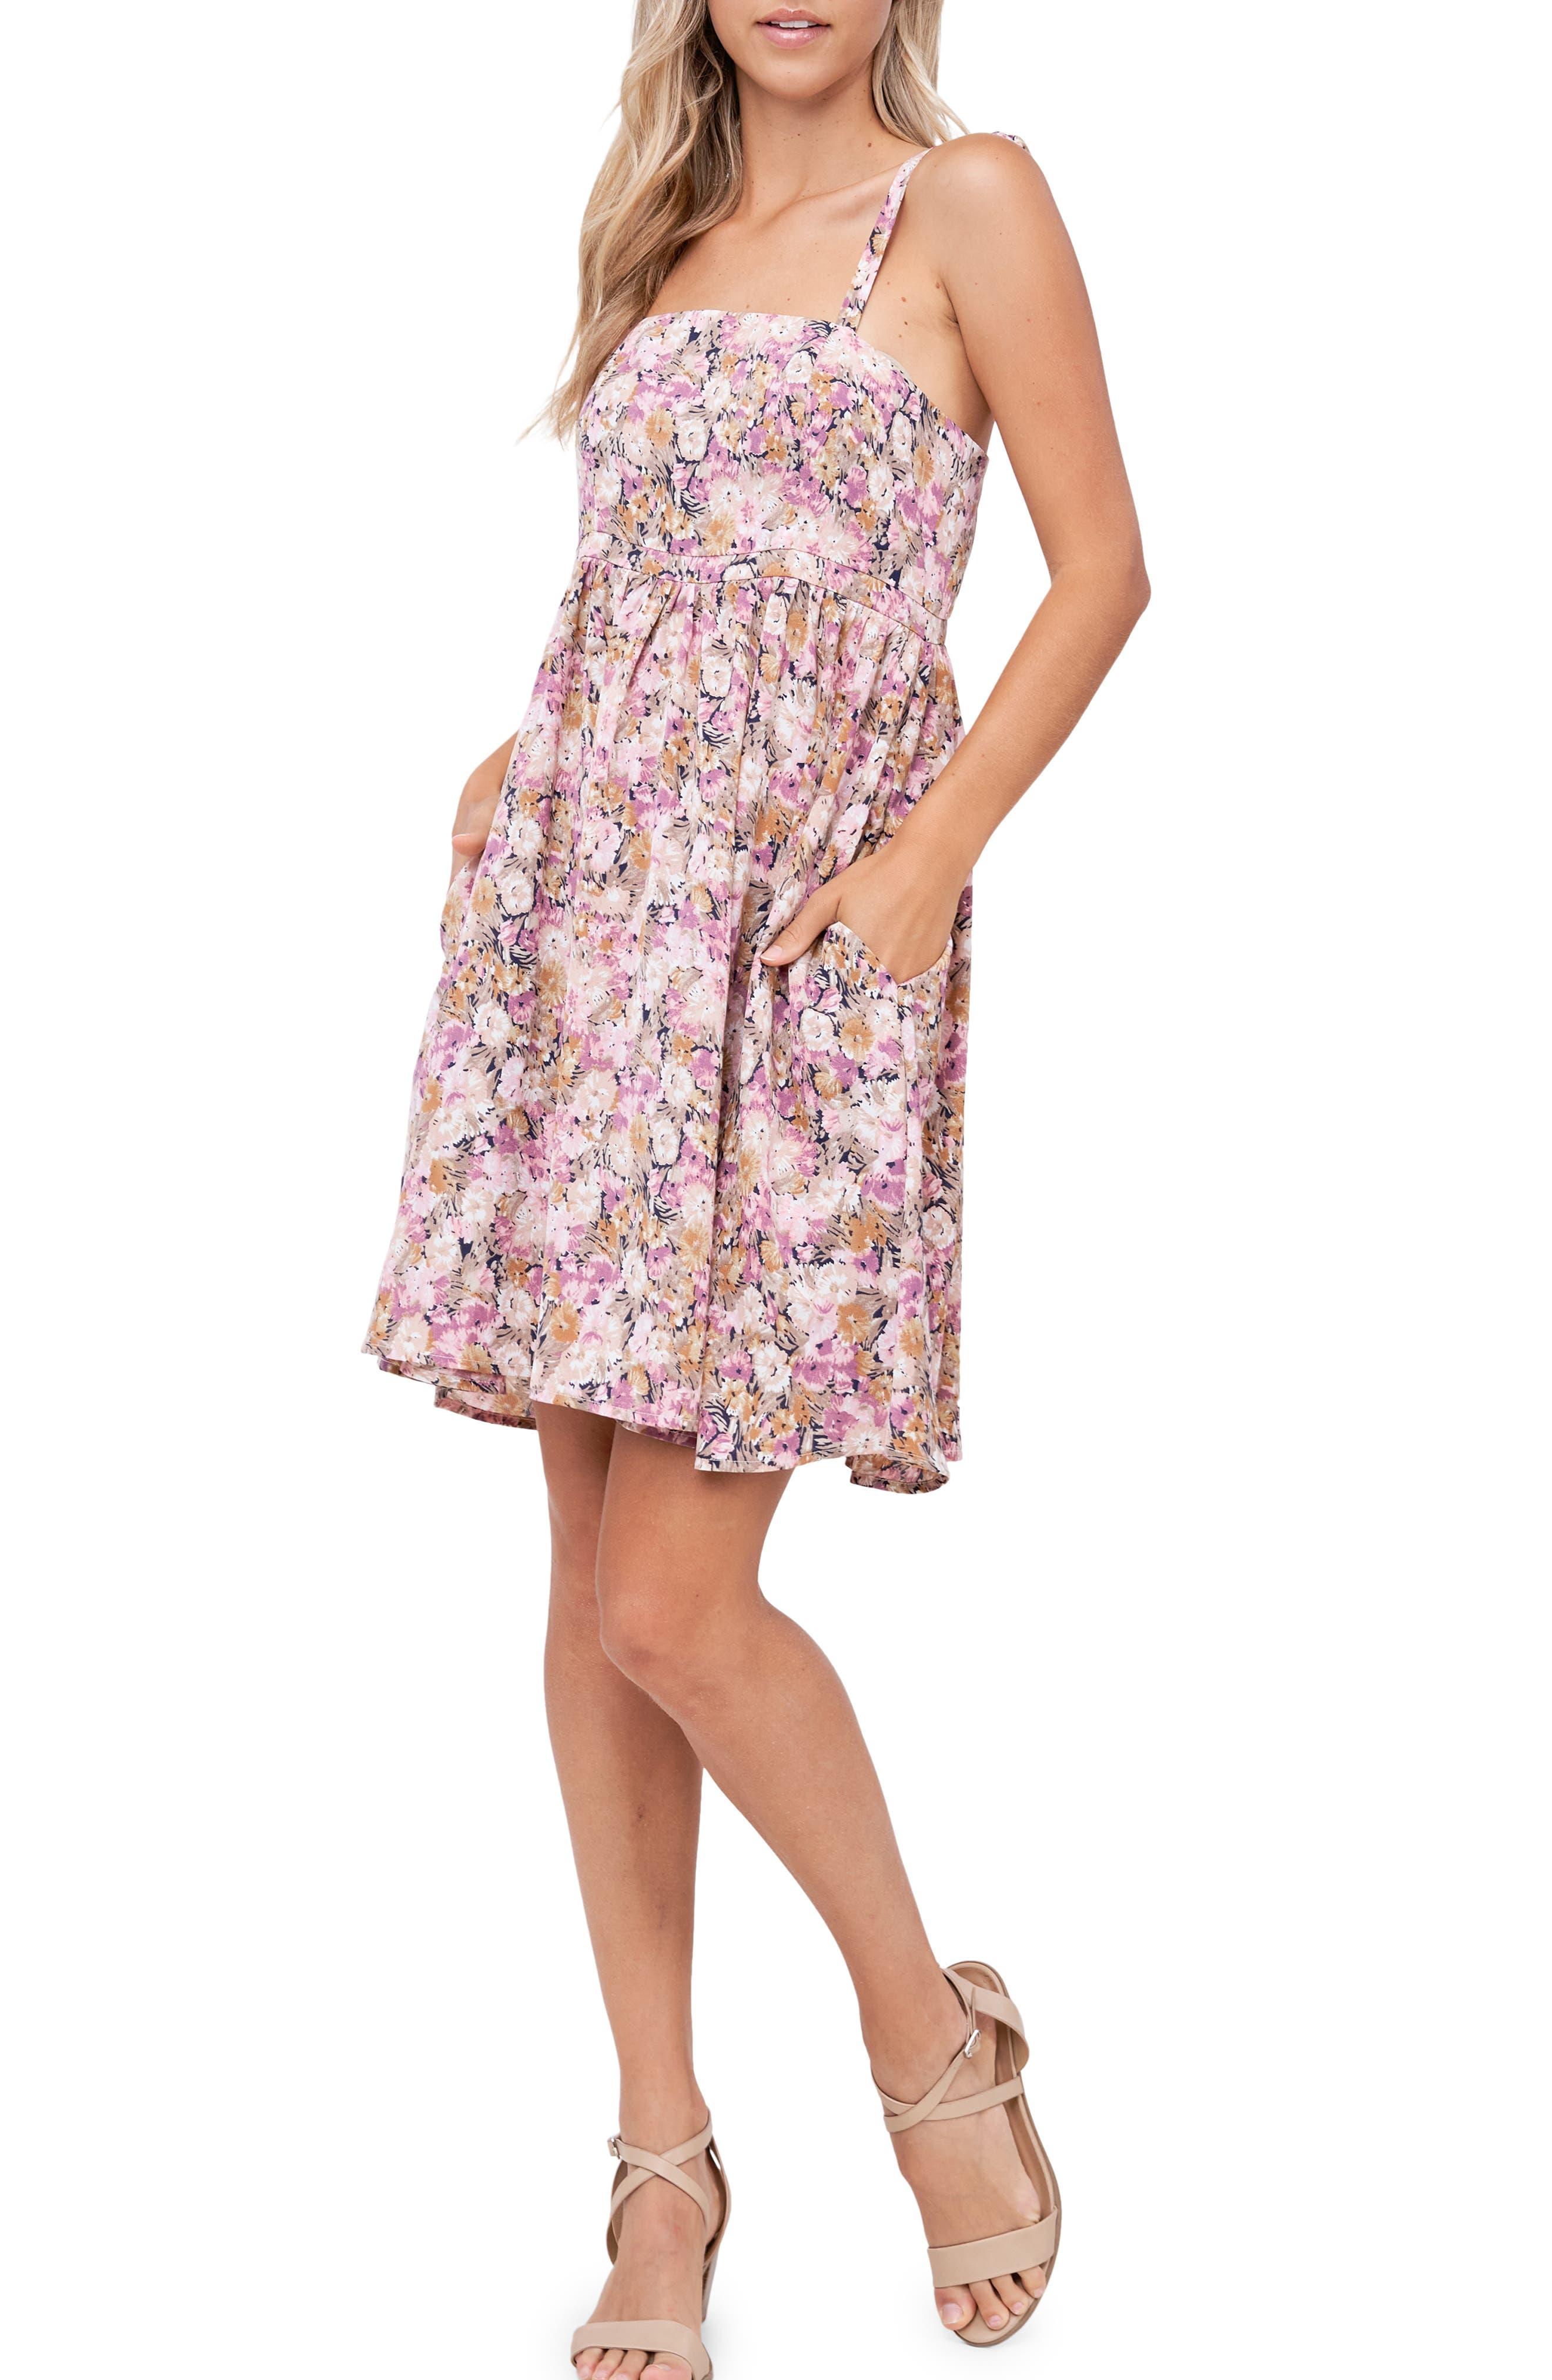 Floral Print Sleeveless Sundress